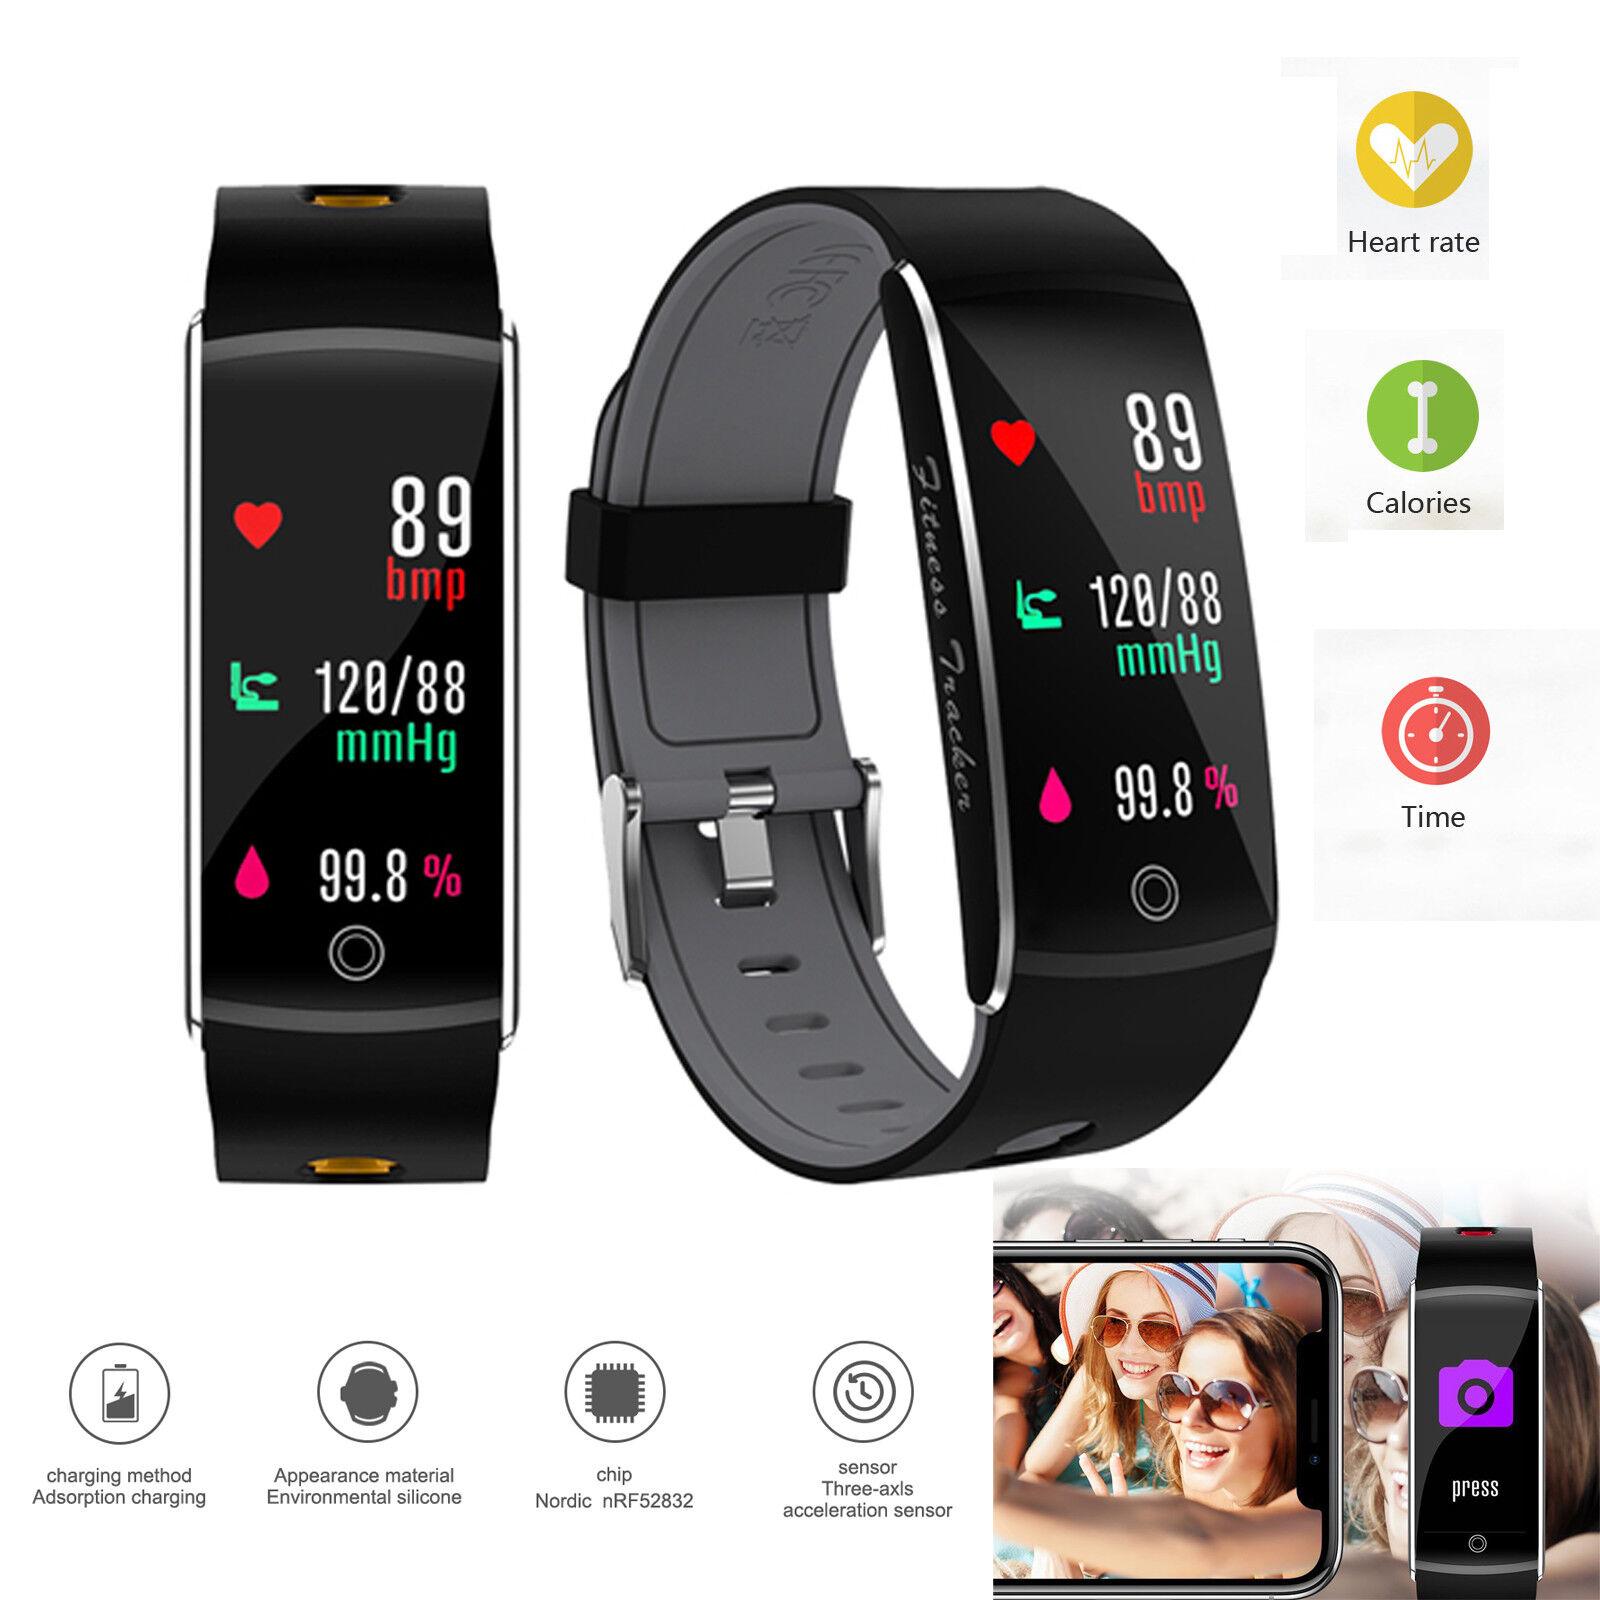 Activity Tracker Sports Bracelet Bluetooth WristBand Heart Rate Sleep Monitor activity bluetooth bracelet Featured heart monitor rate sleep sports tracker wristband